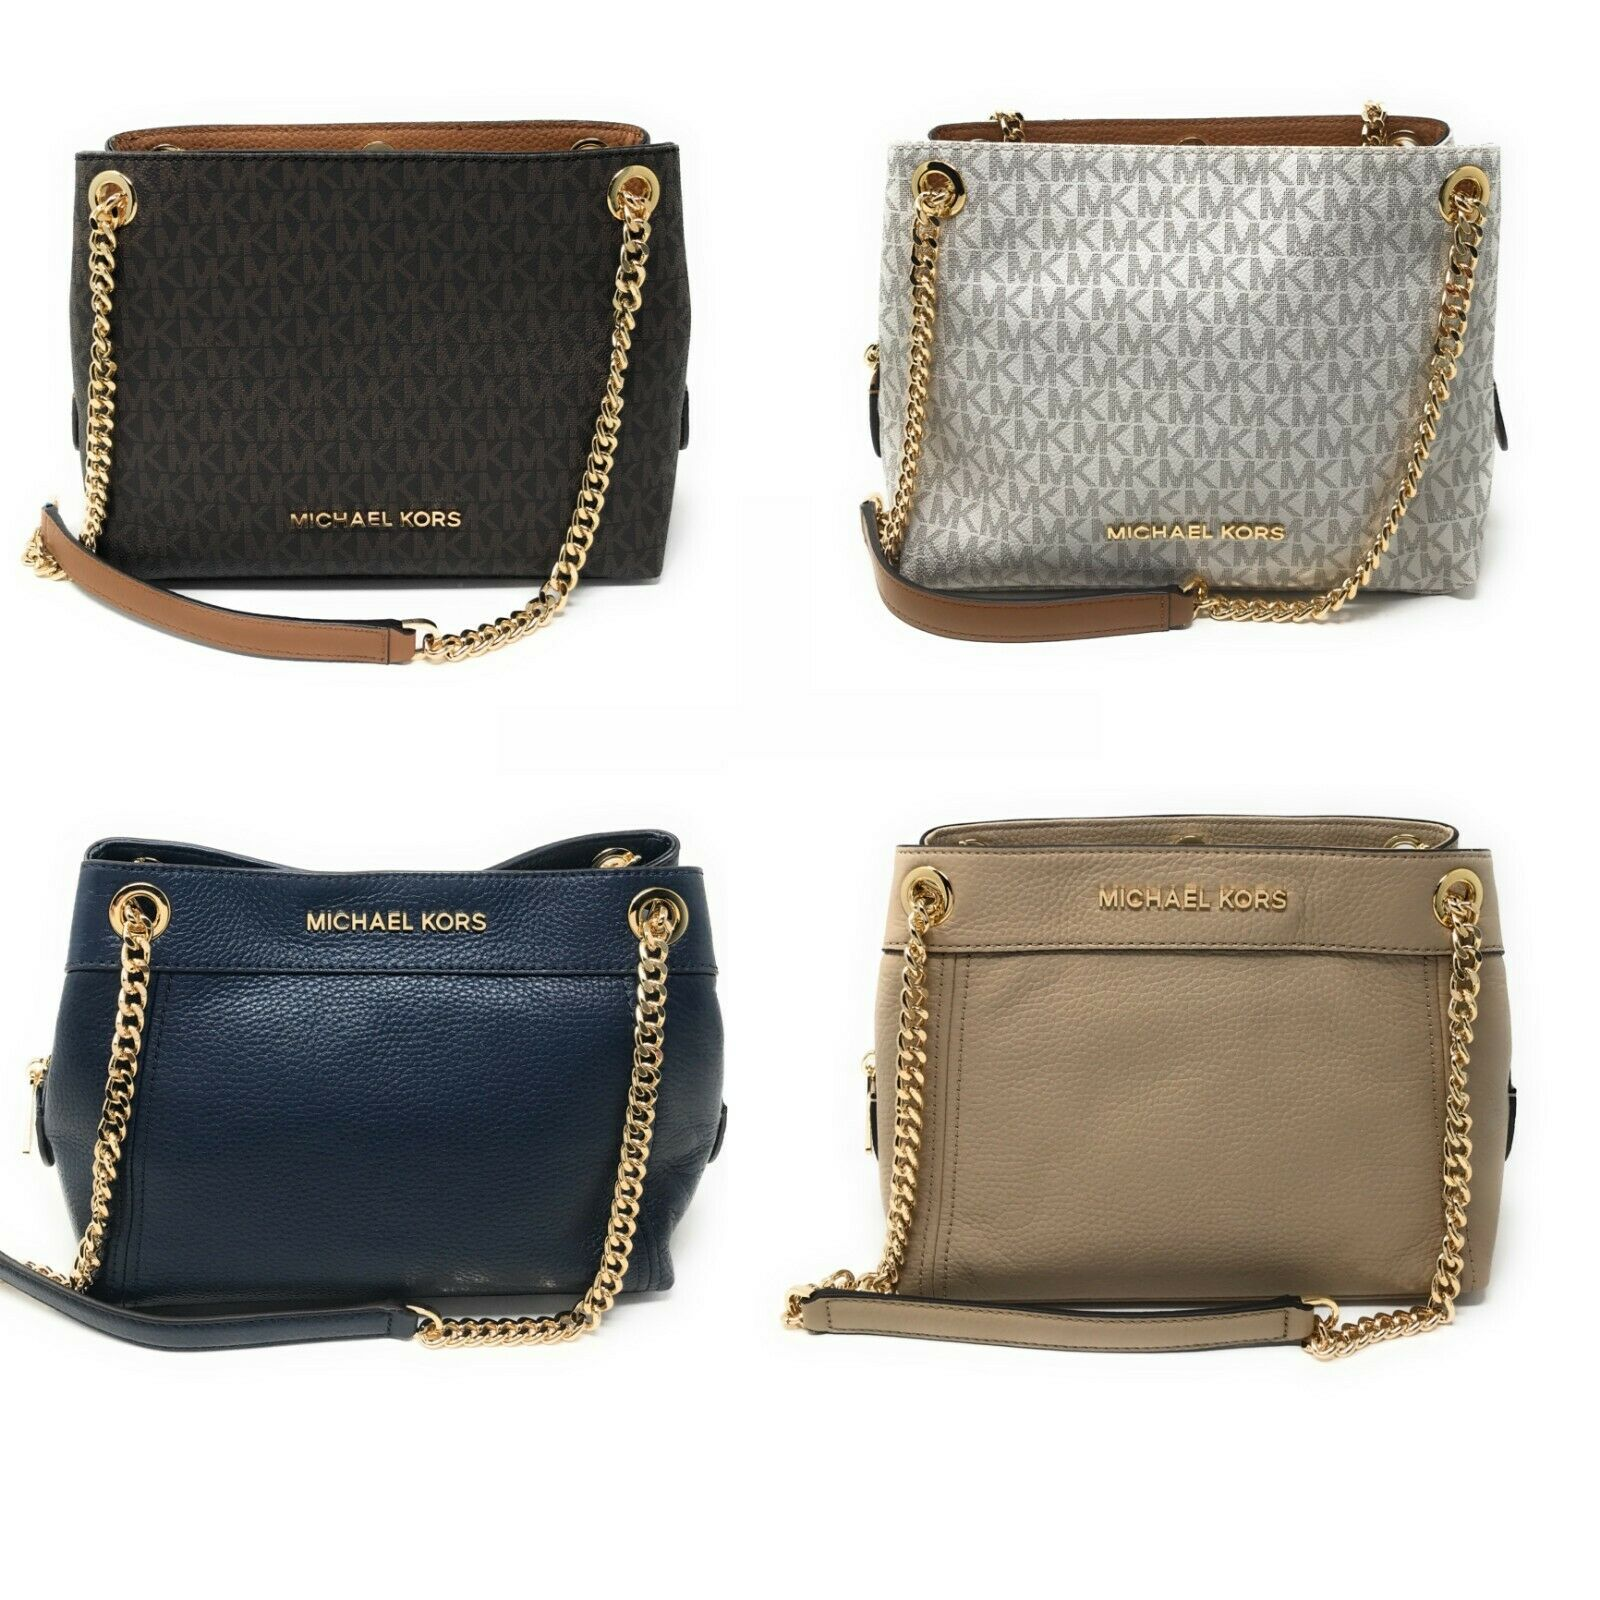 michael-kors-jet-set-item-medium-chain-messenger-shoulder-bag-purse-crossbody